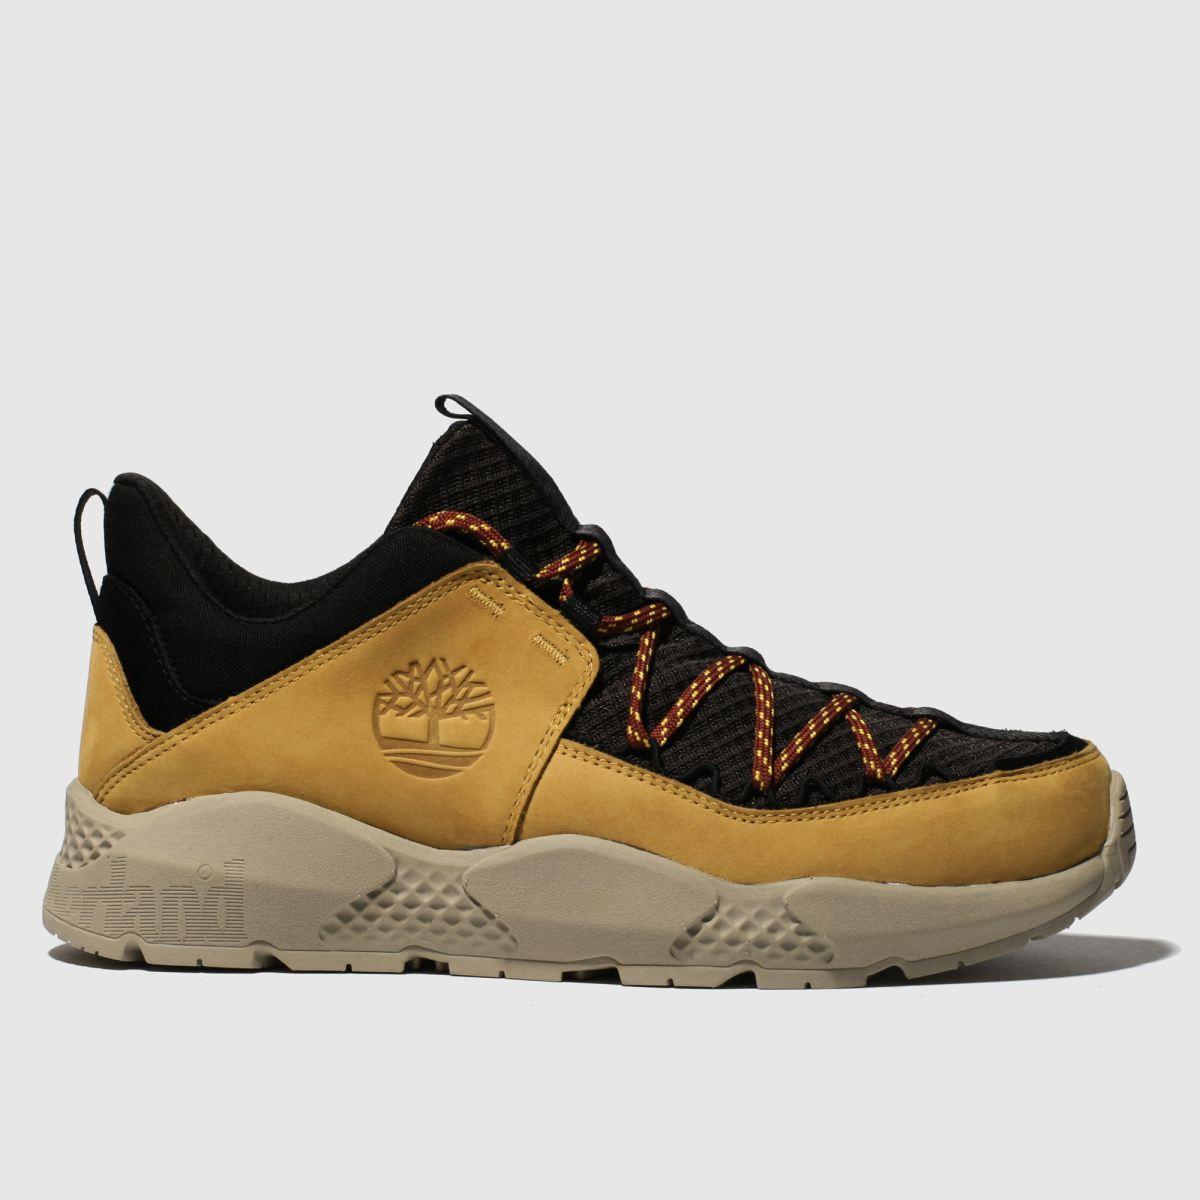 Timberland Tan Ripcord Low Boots